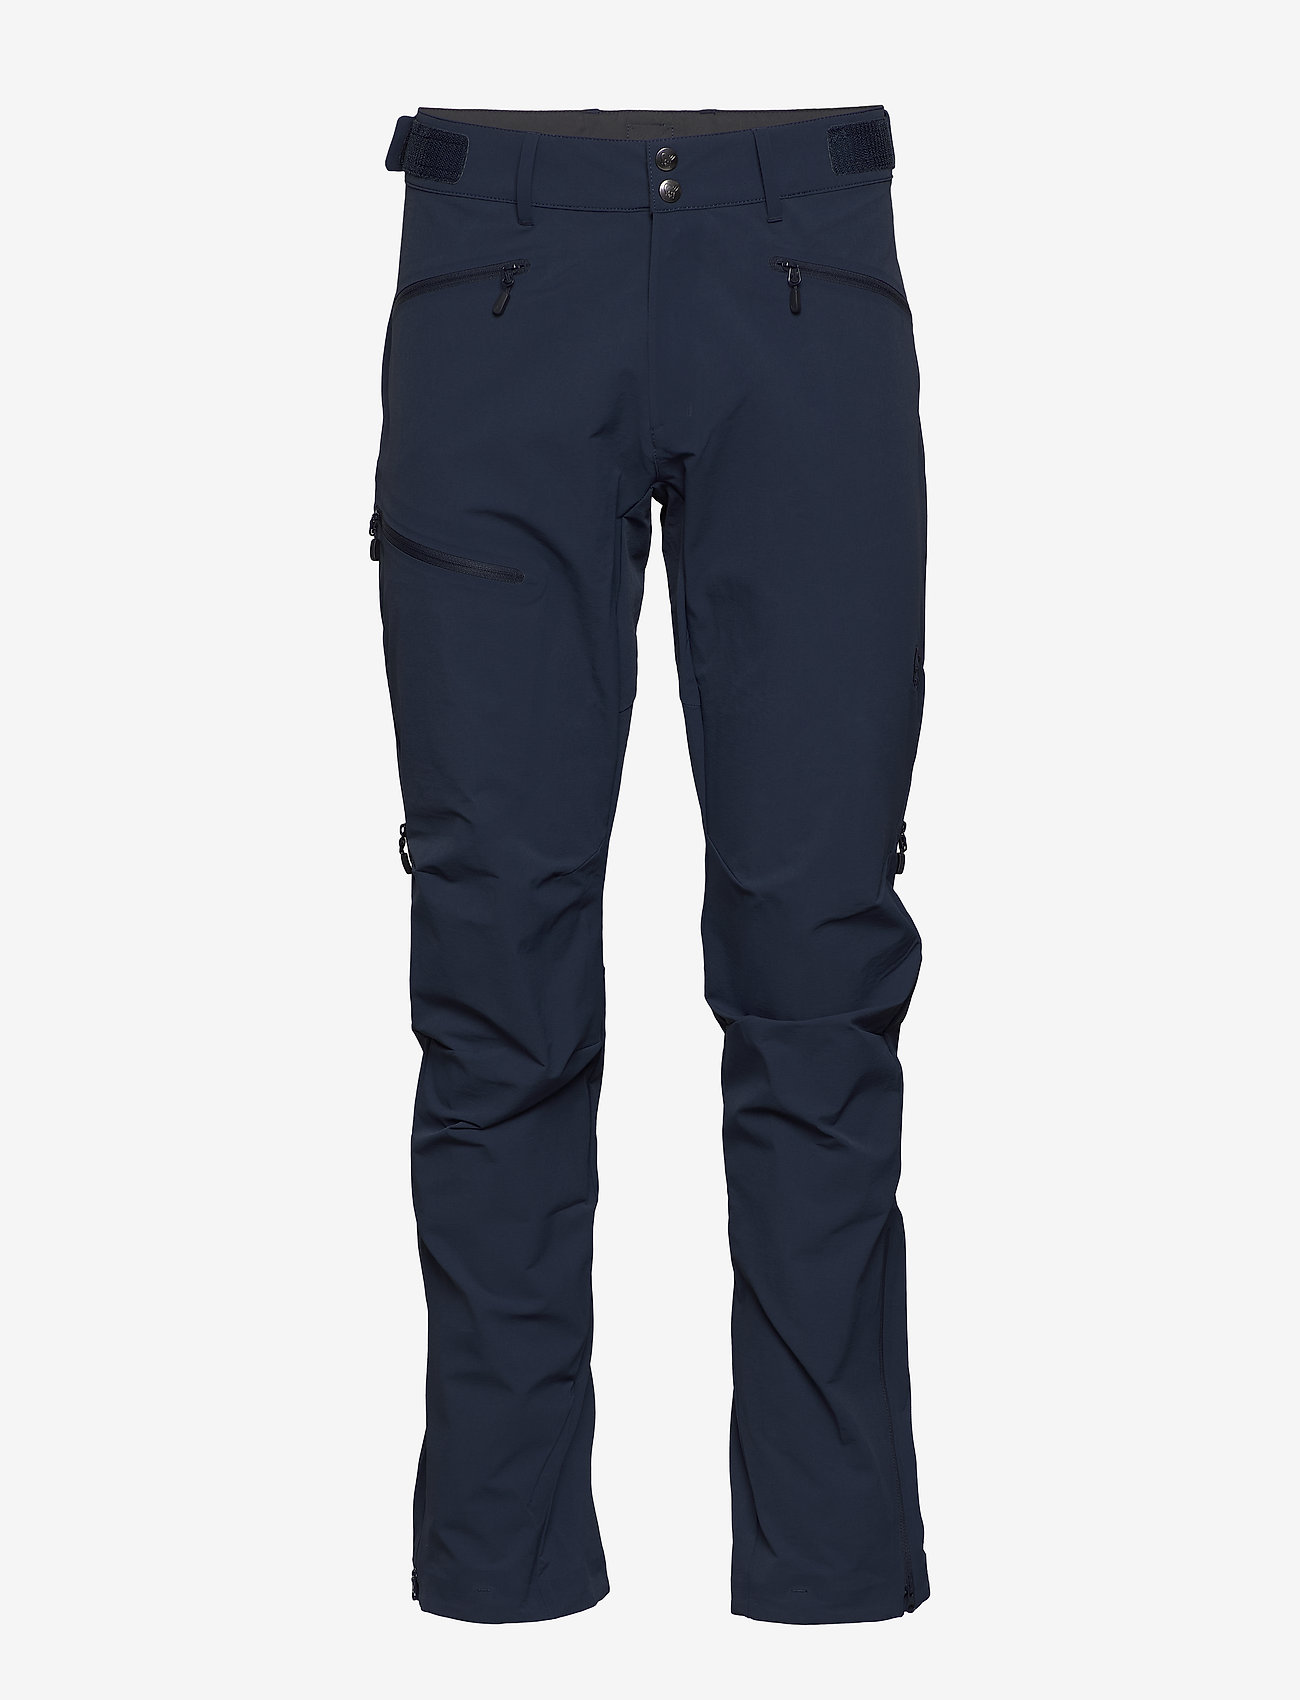 Norrøna - falketind flex1 Pants M's - softshellhose - indigo night - 0